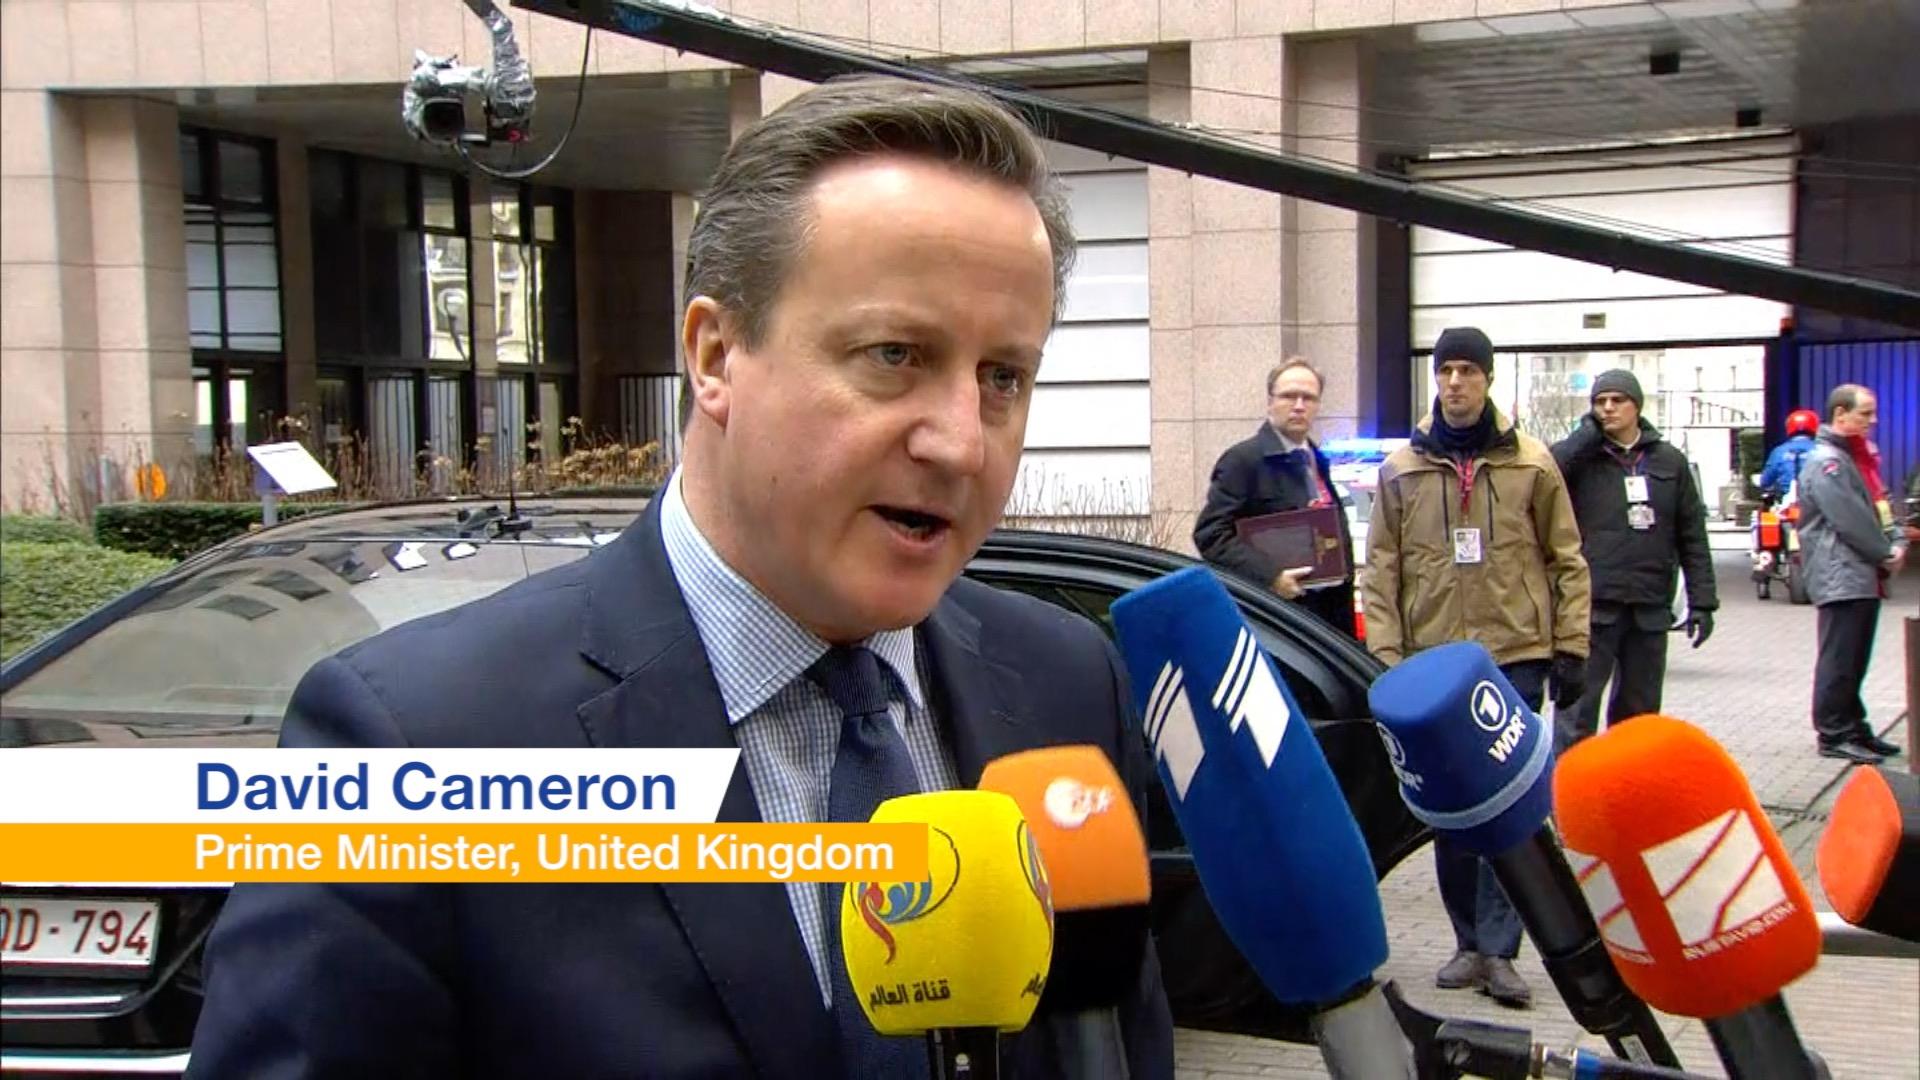 David Cameron talks about Brexit